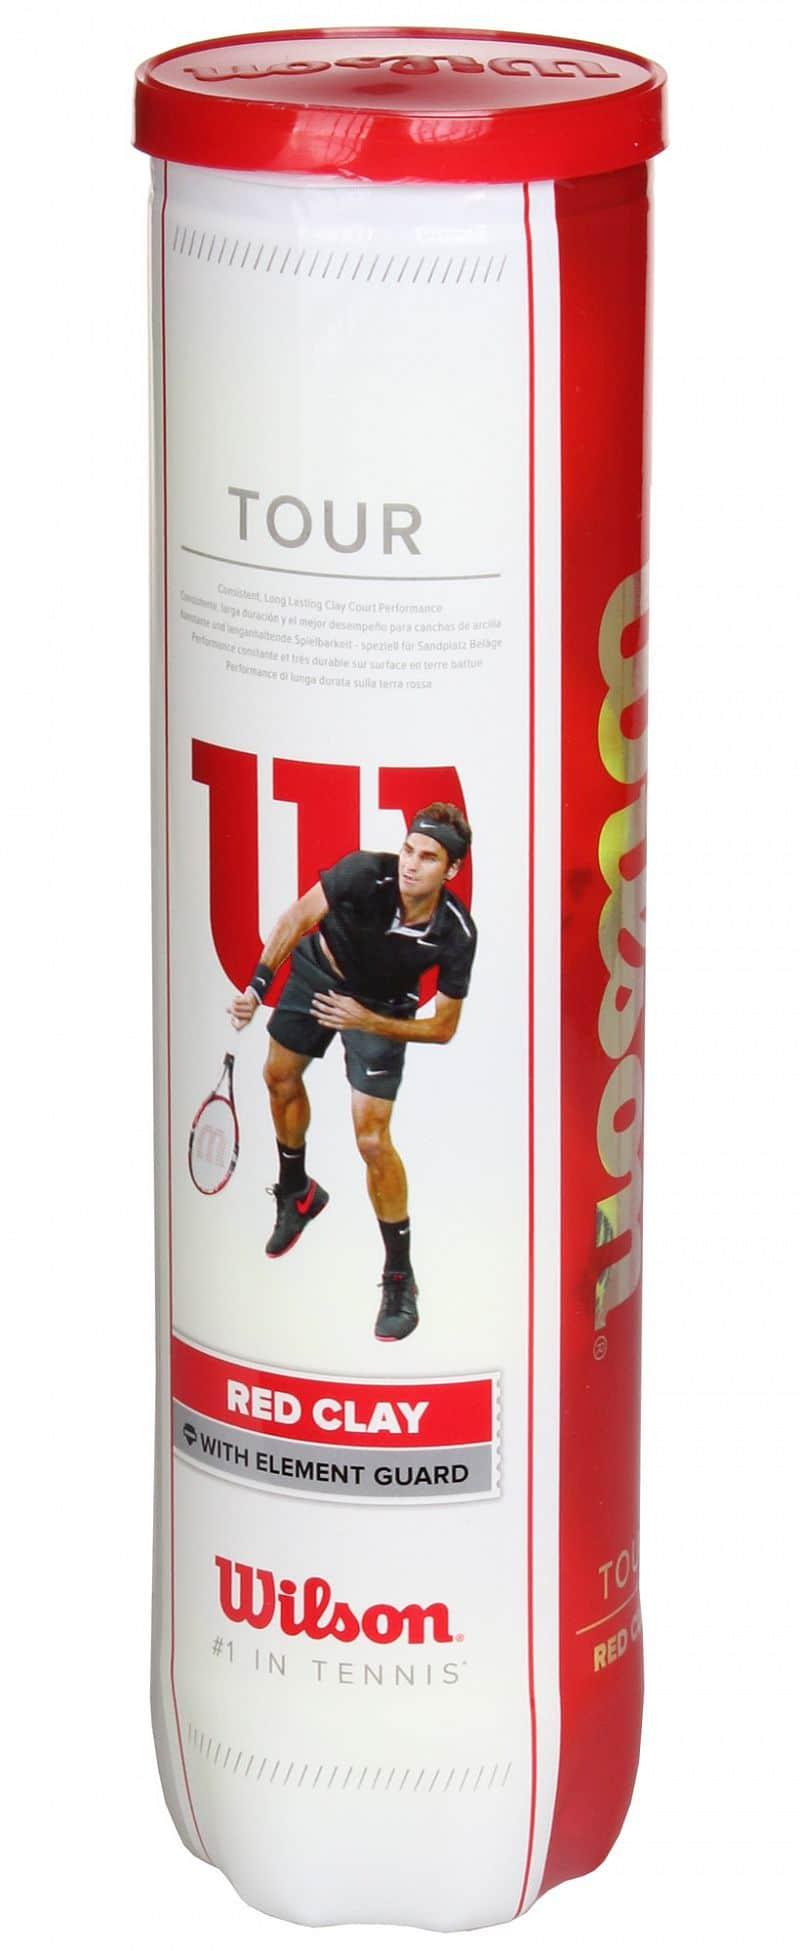 Tour Red Clay tenisové míče 4 ks